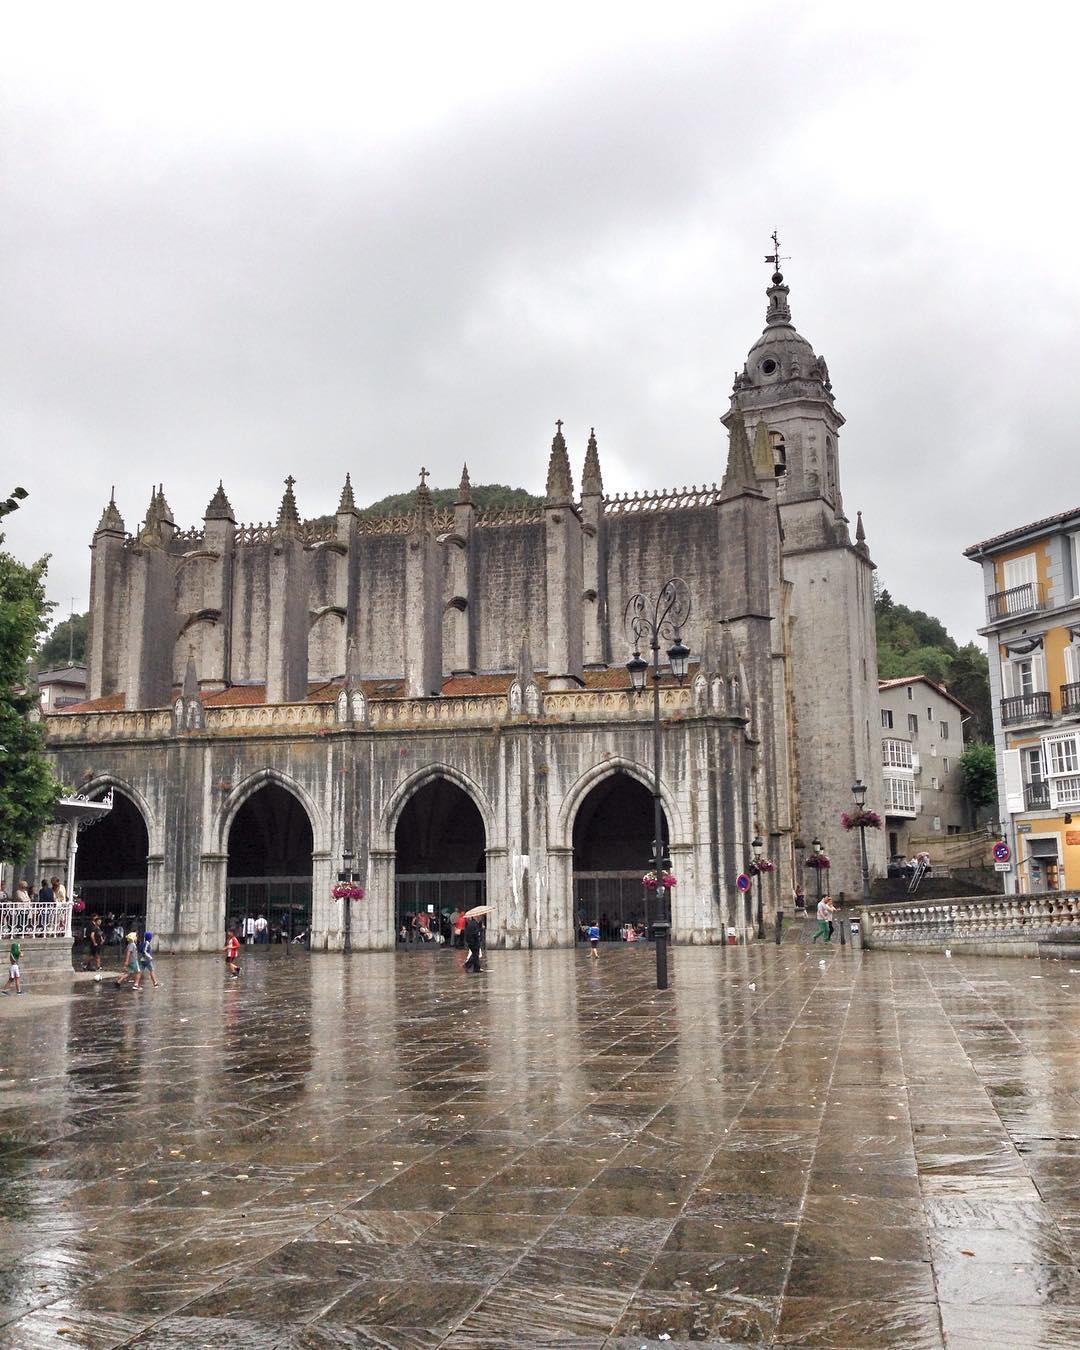 La iglesia Lekeitio - La Iglesia Lekeitio